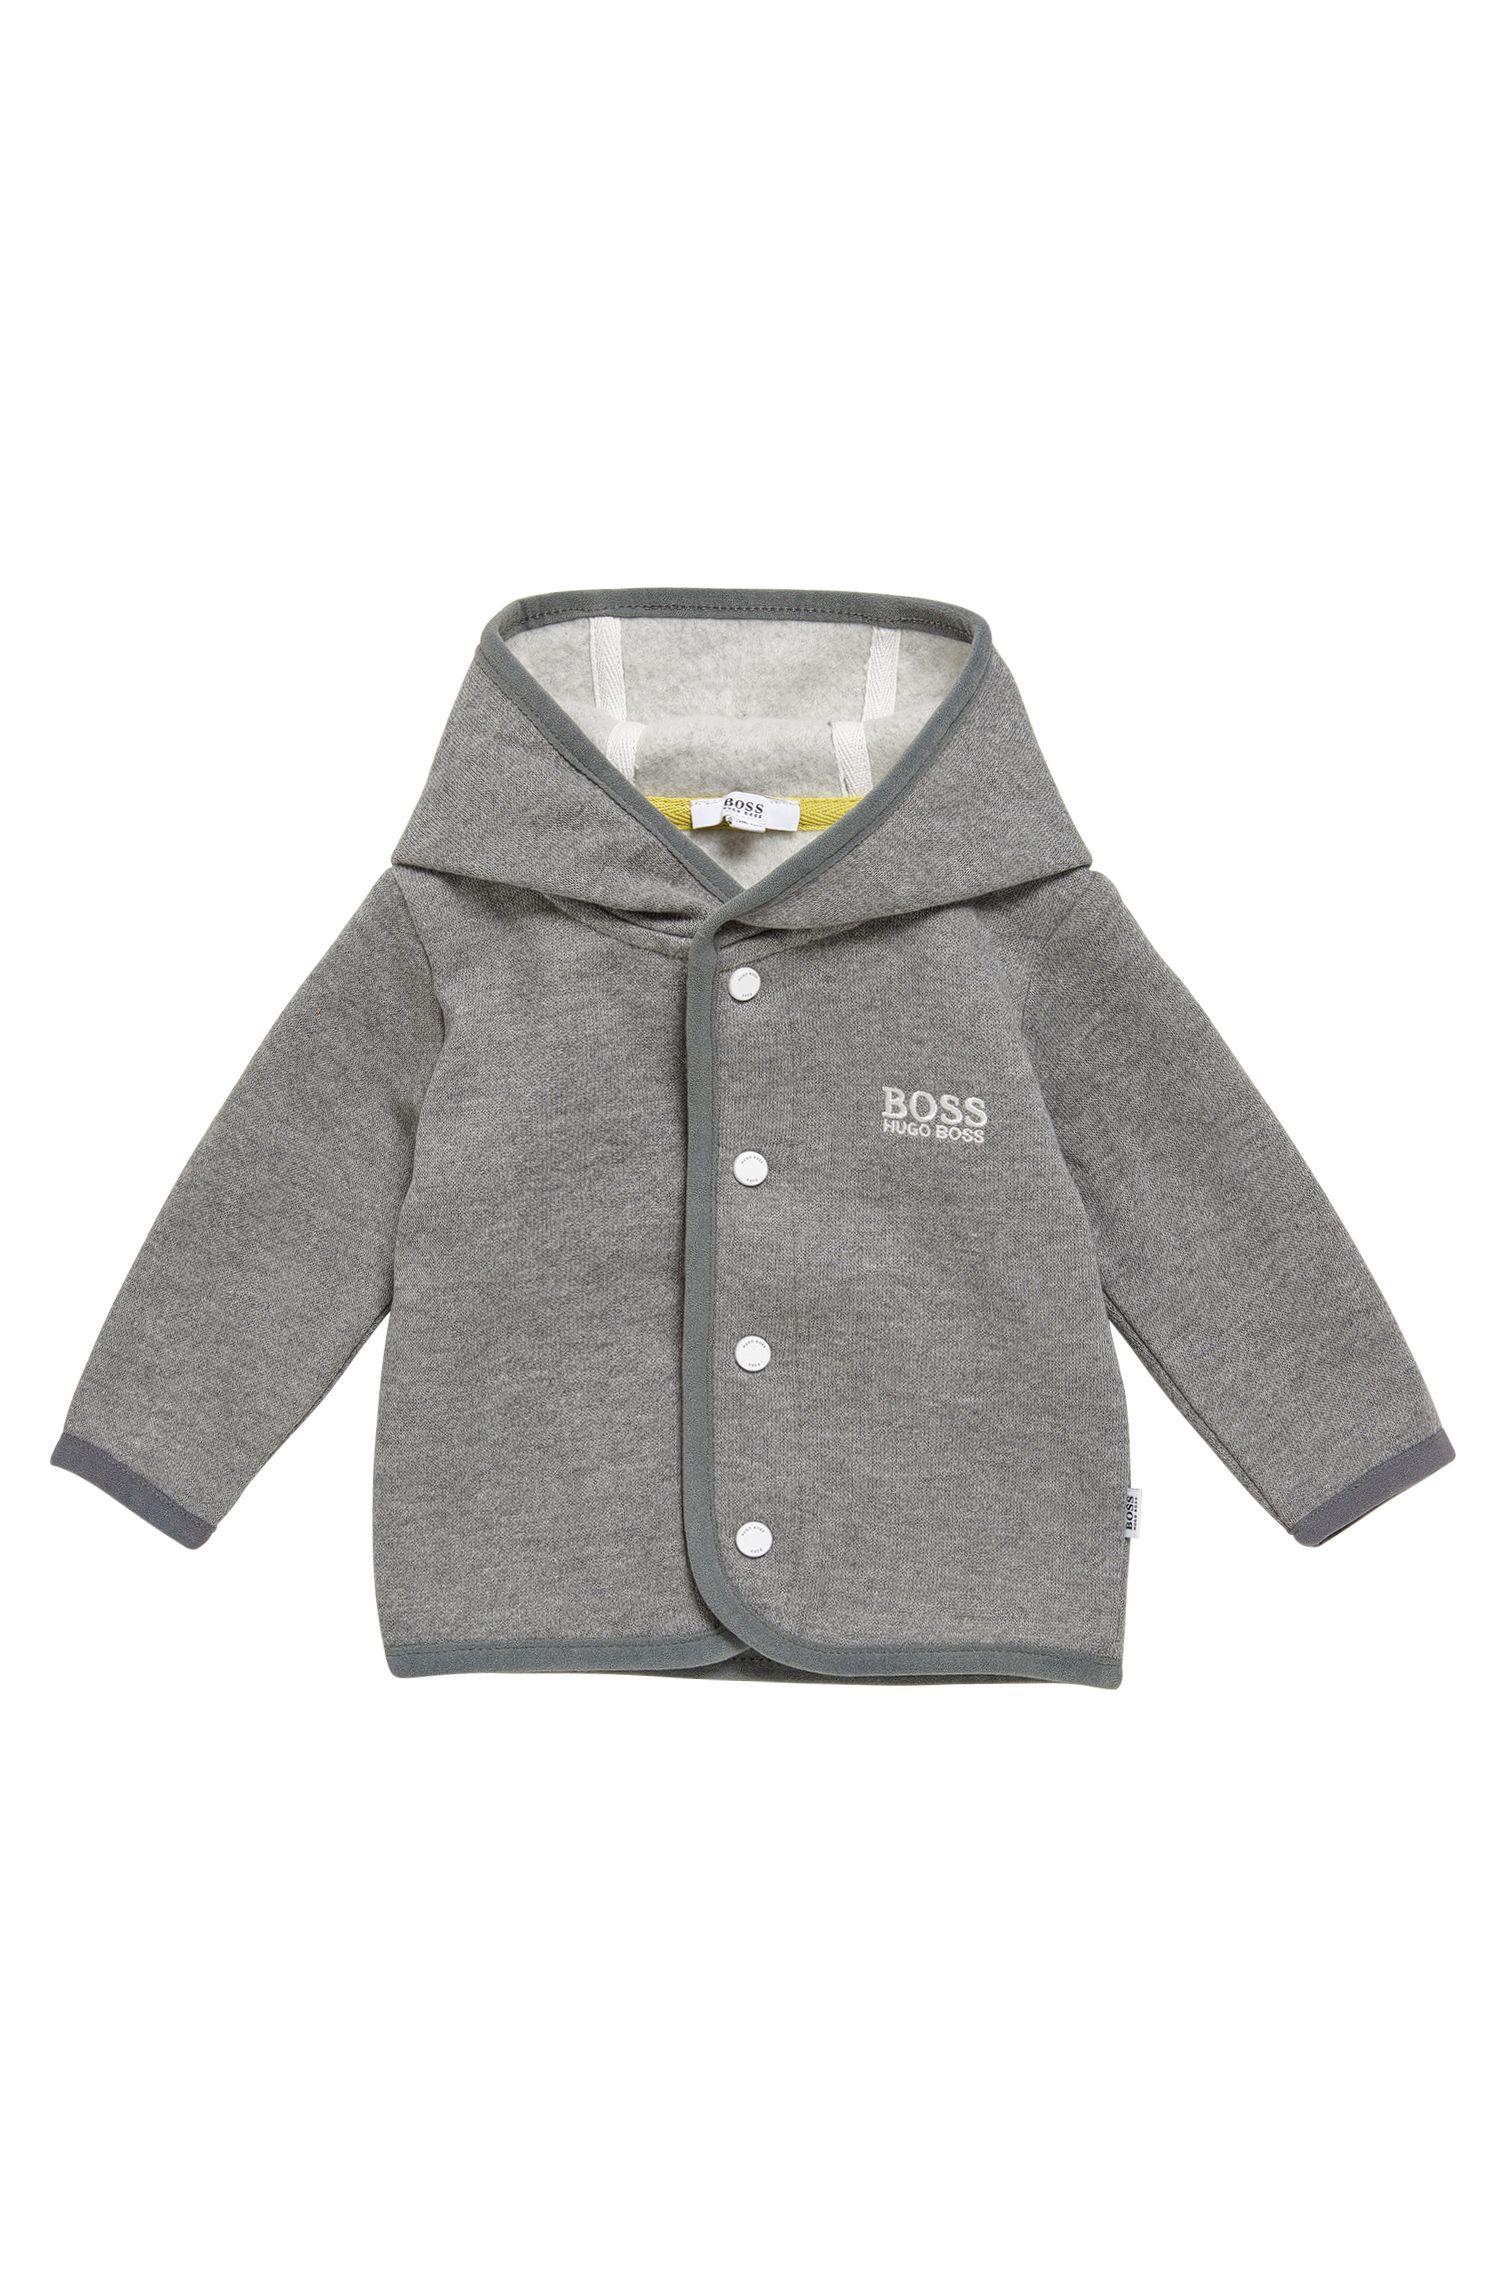 Newborn hooded sweatshirt jacket in cotton blend: 'J95212'